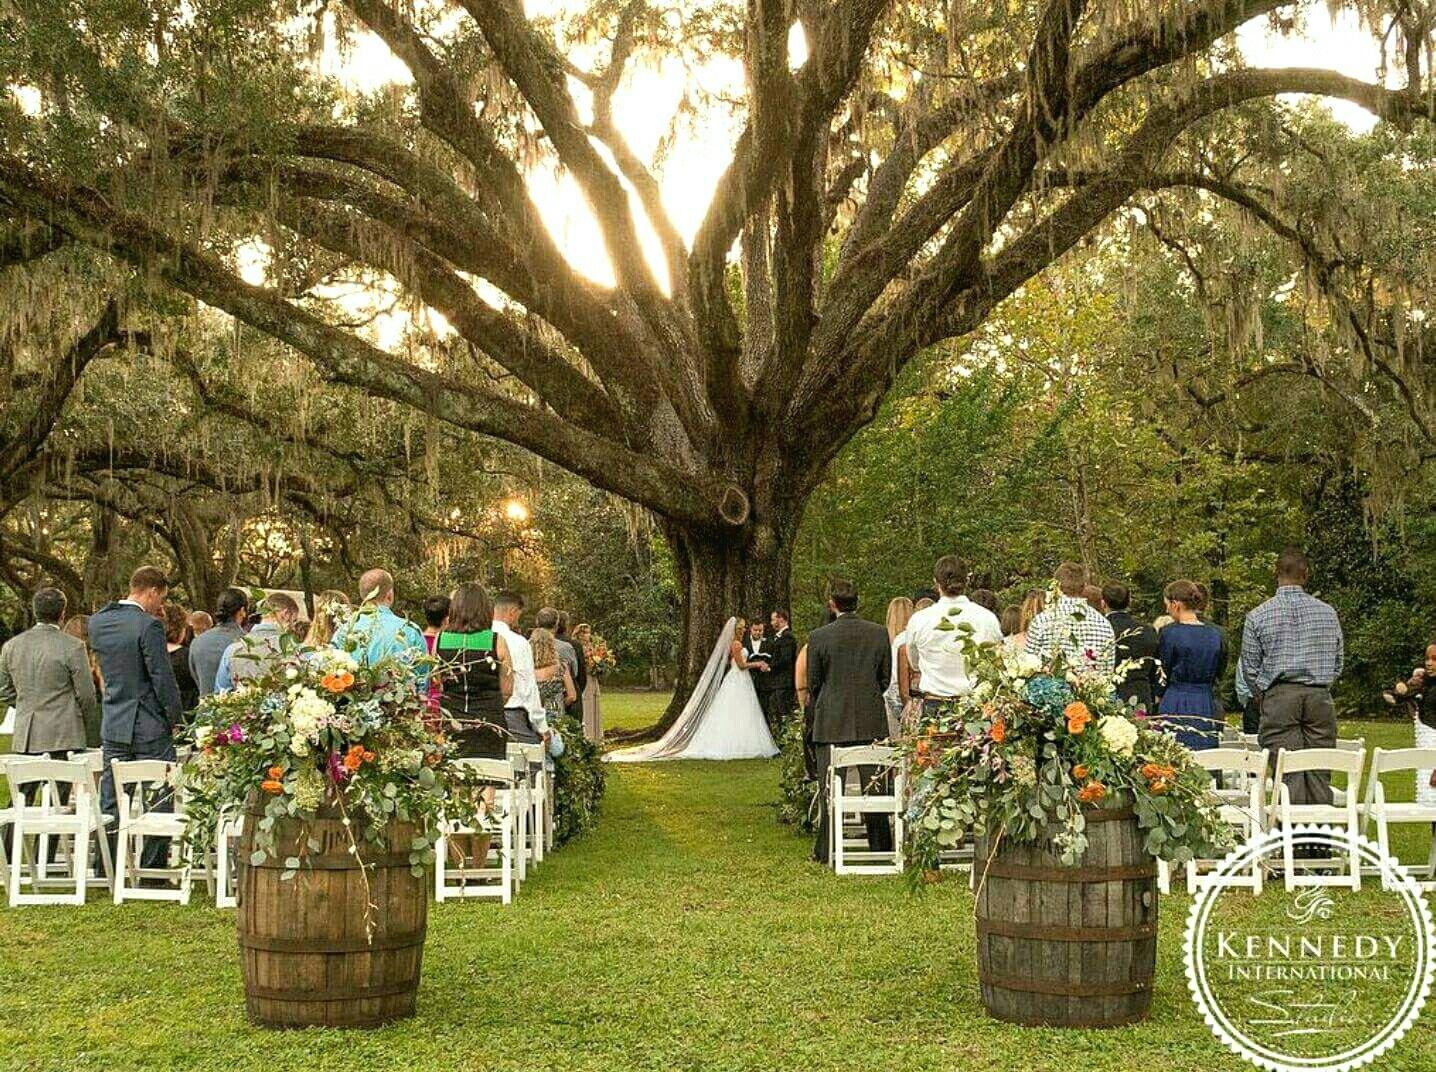 Eden Gardens State Park Oak Tree Fall Wedding Outdoor Wedding Florida R U S T I C W E D D